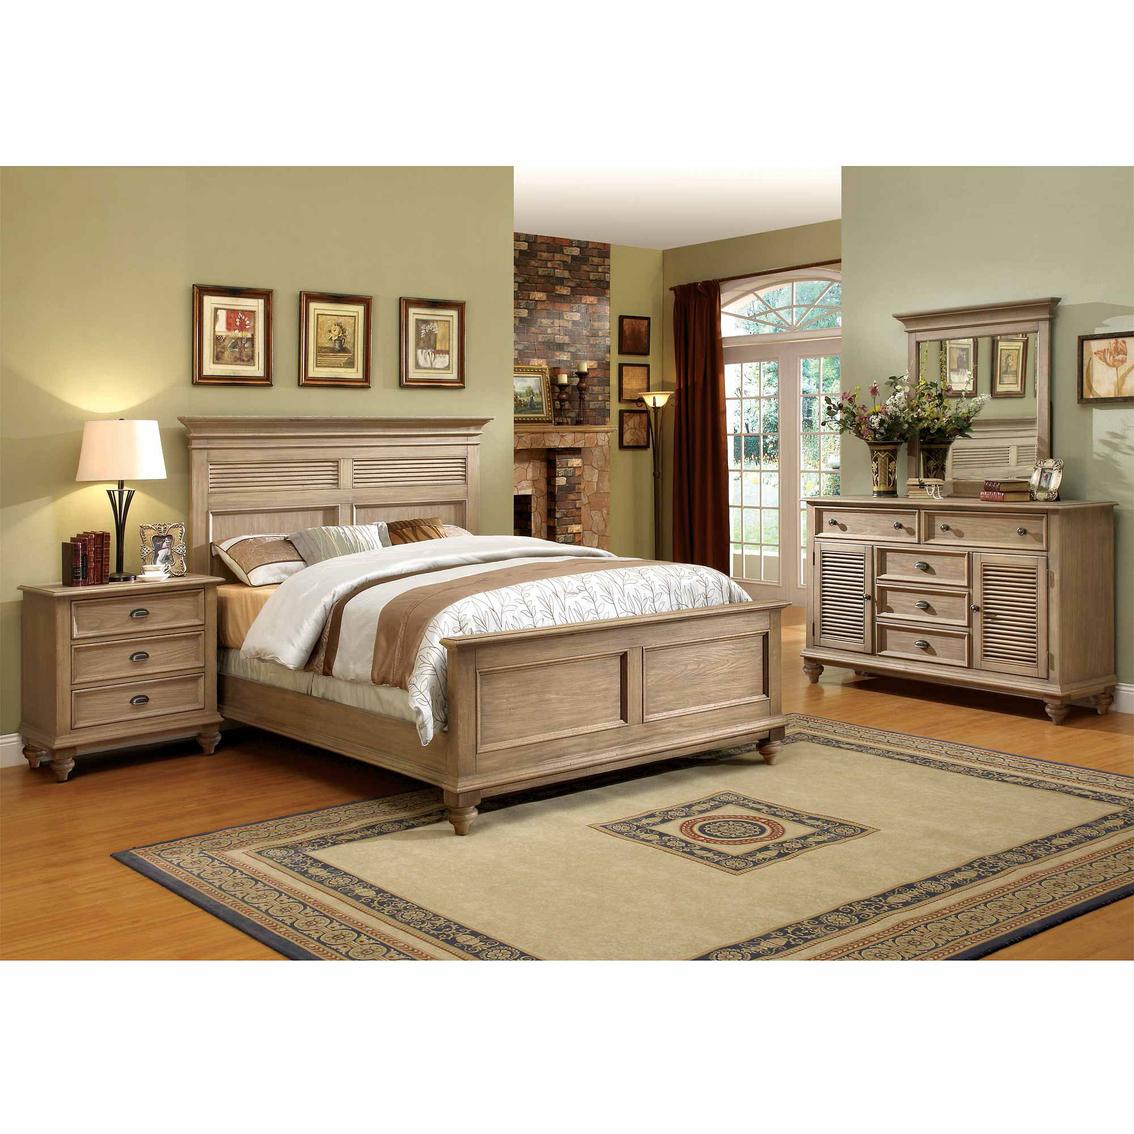 Riverside coventry shutter 4 pc bedroom set bedroom - Bedroom furniture set online shopping ...